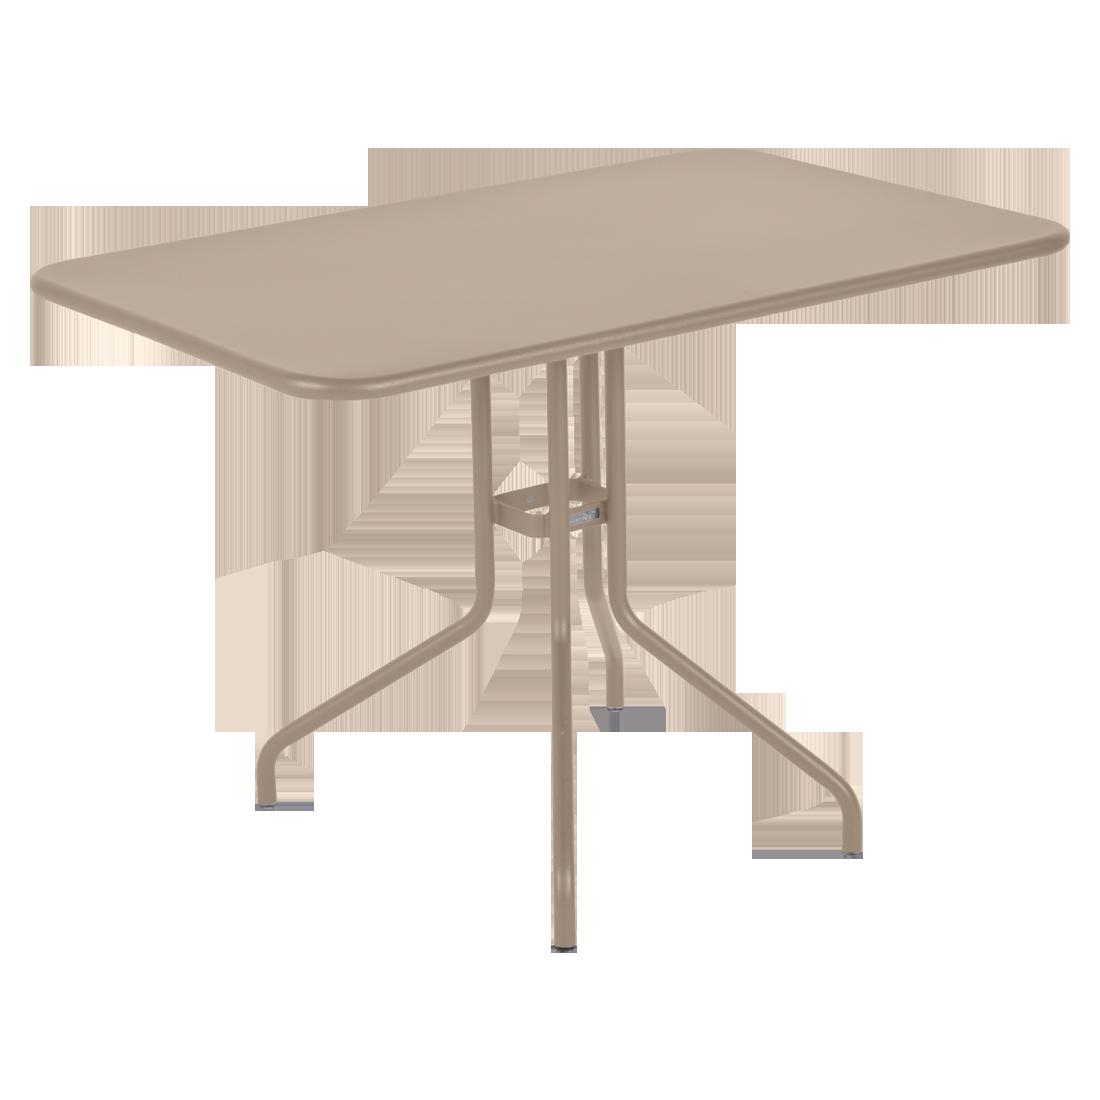 table restaurant, table terrasse, table metal, table pliante metal, mobilier restaurant, table pliante beige